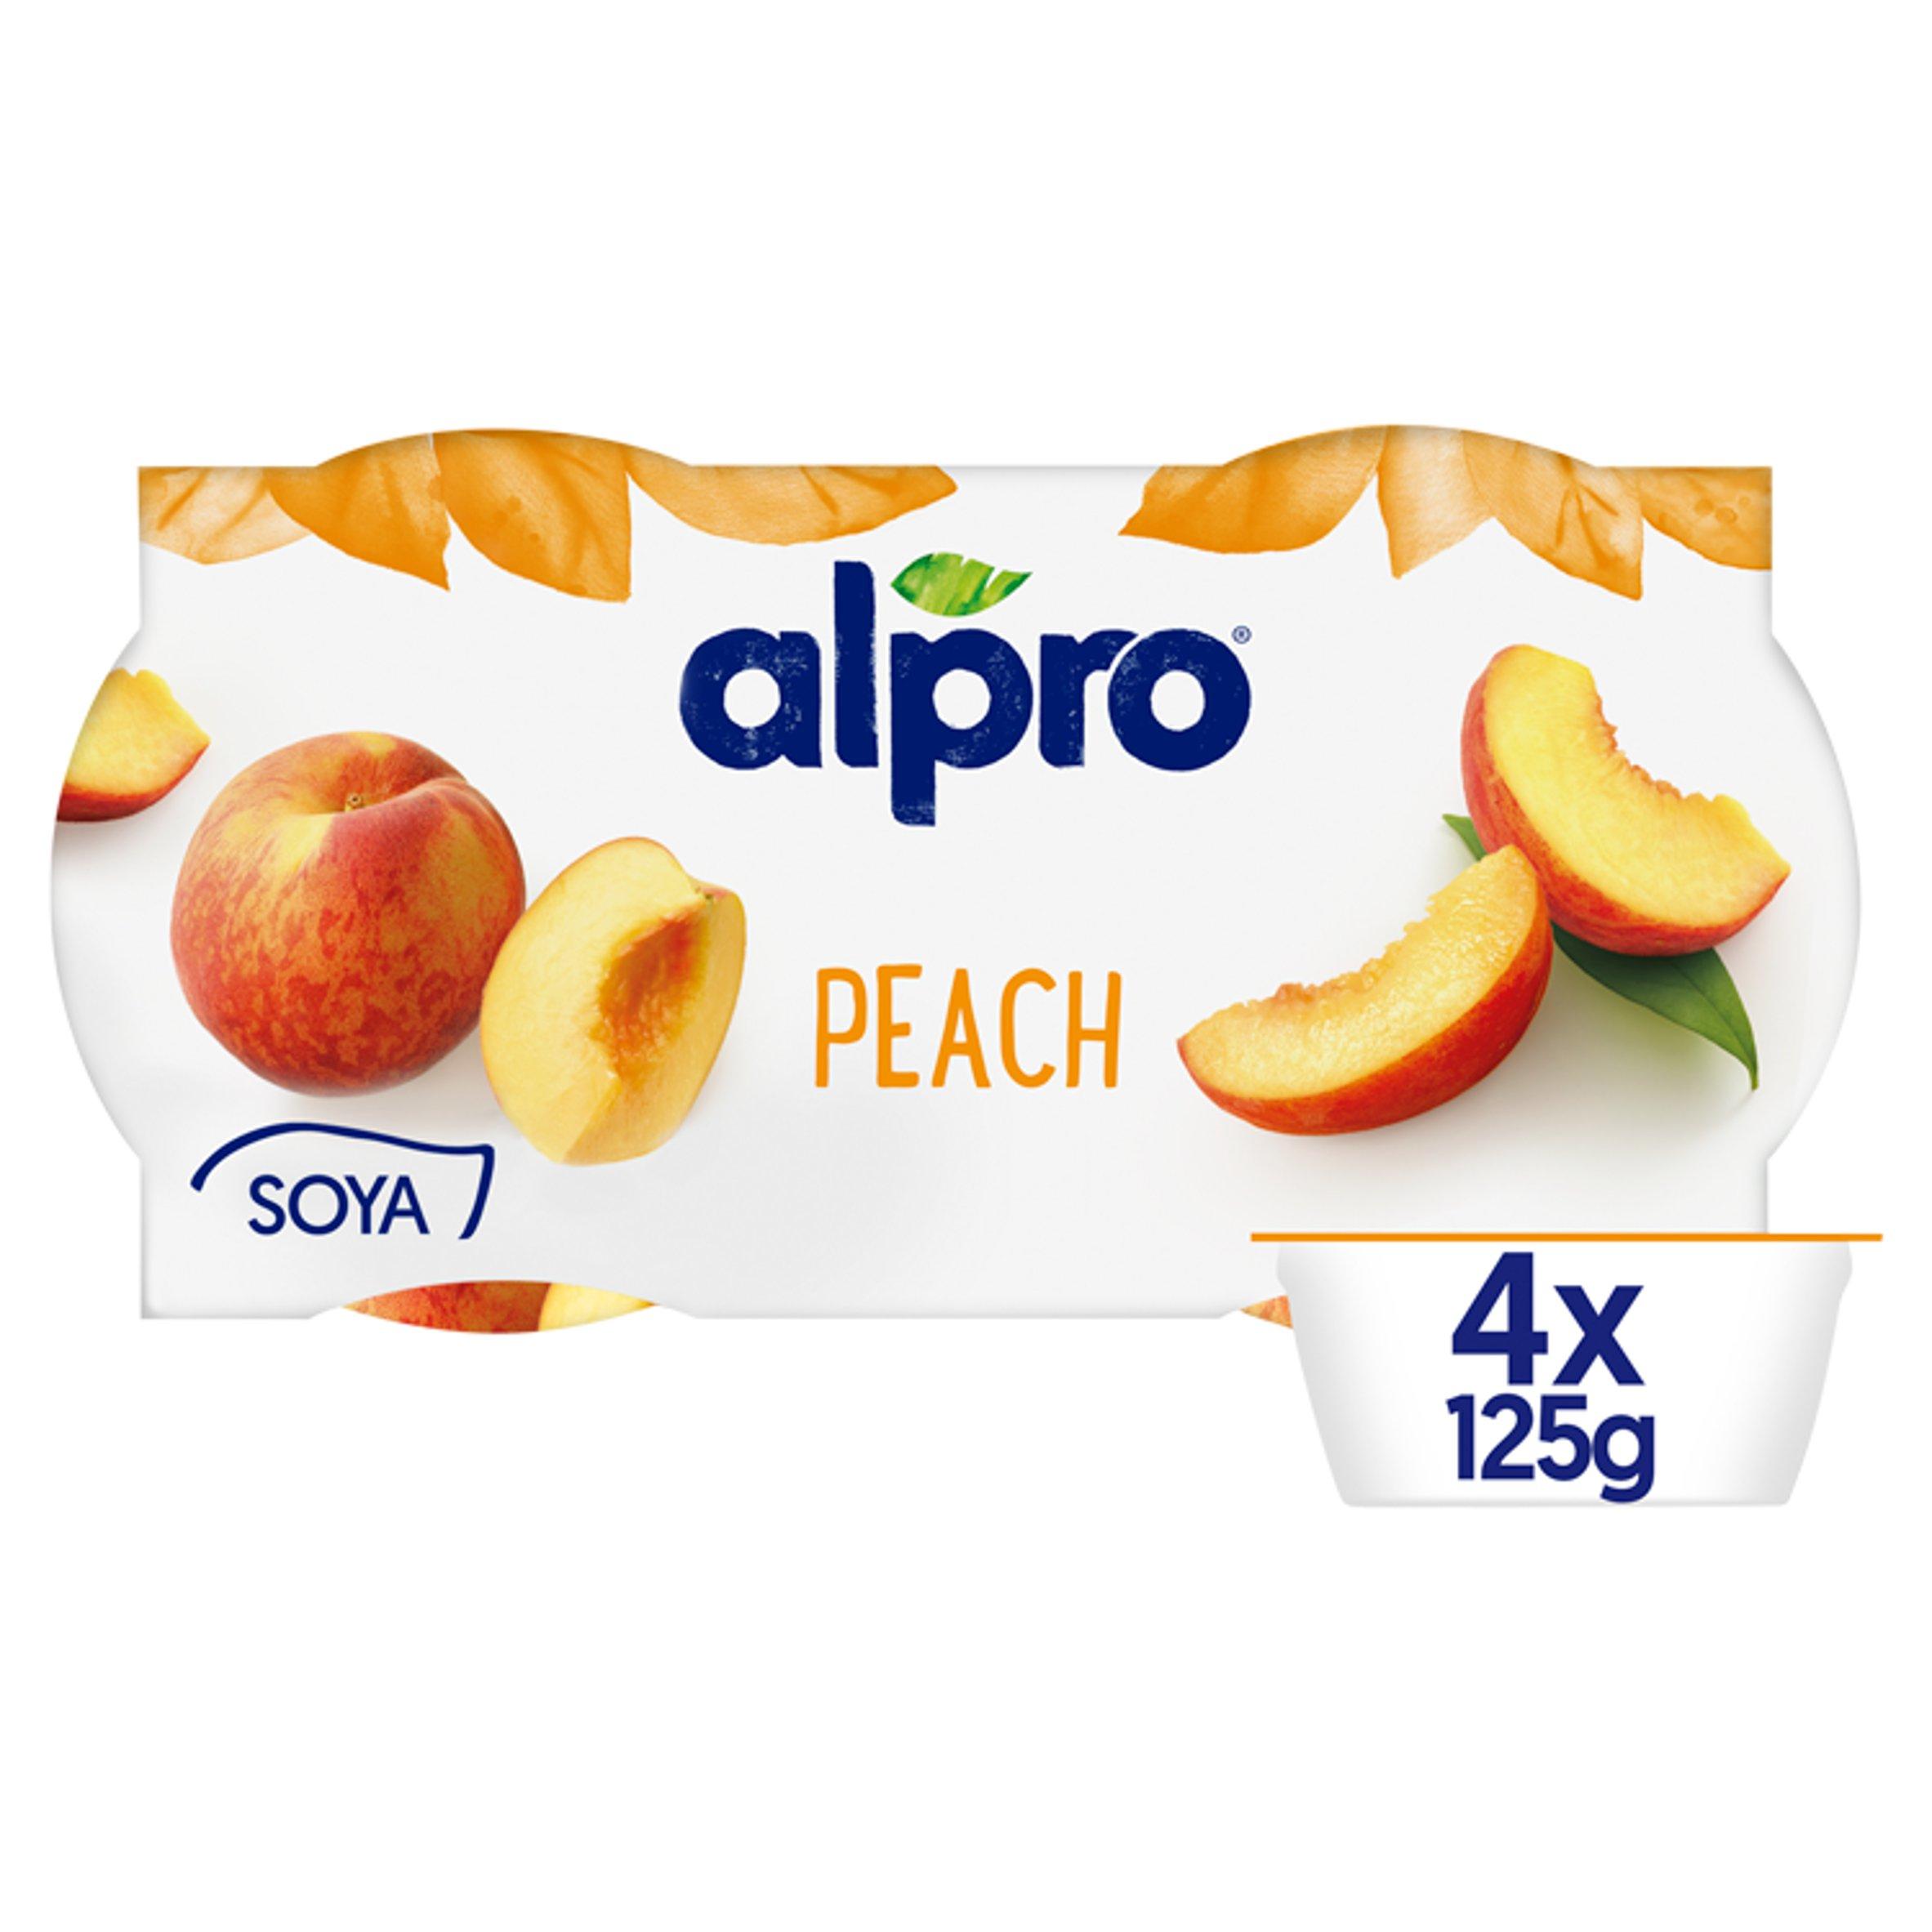 Alpro Peach Yogurt Alternative 4X125g